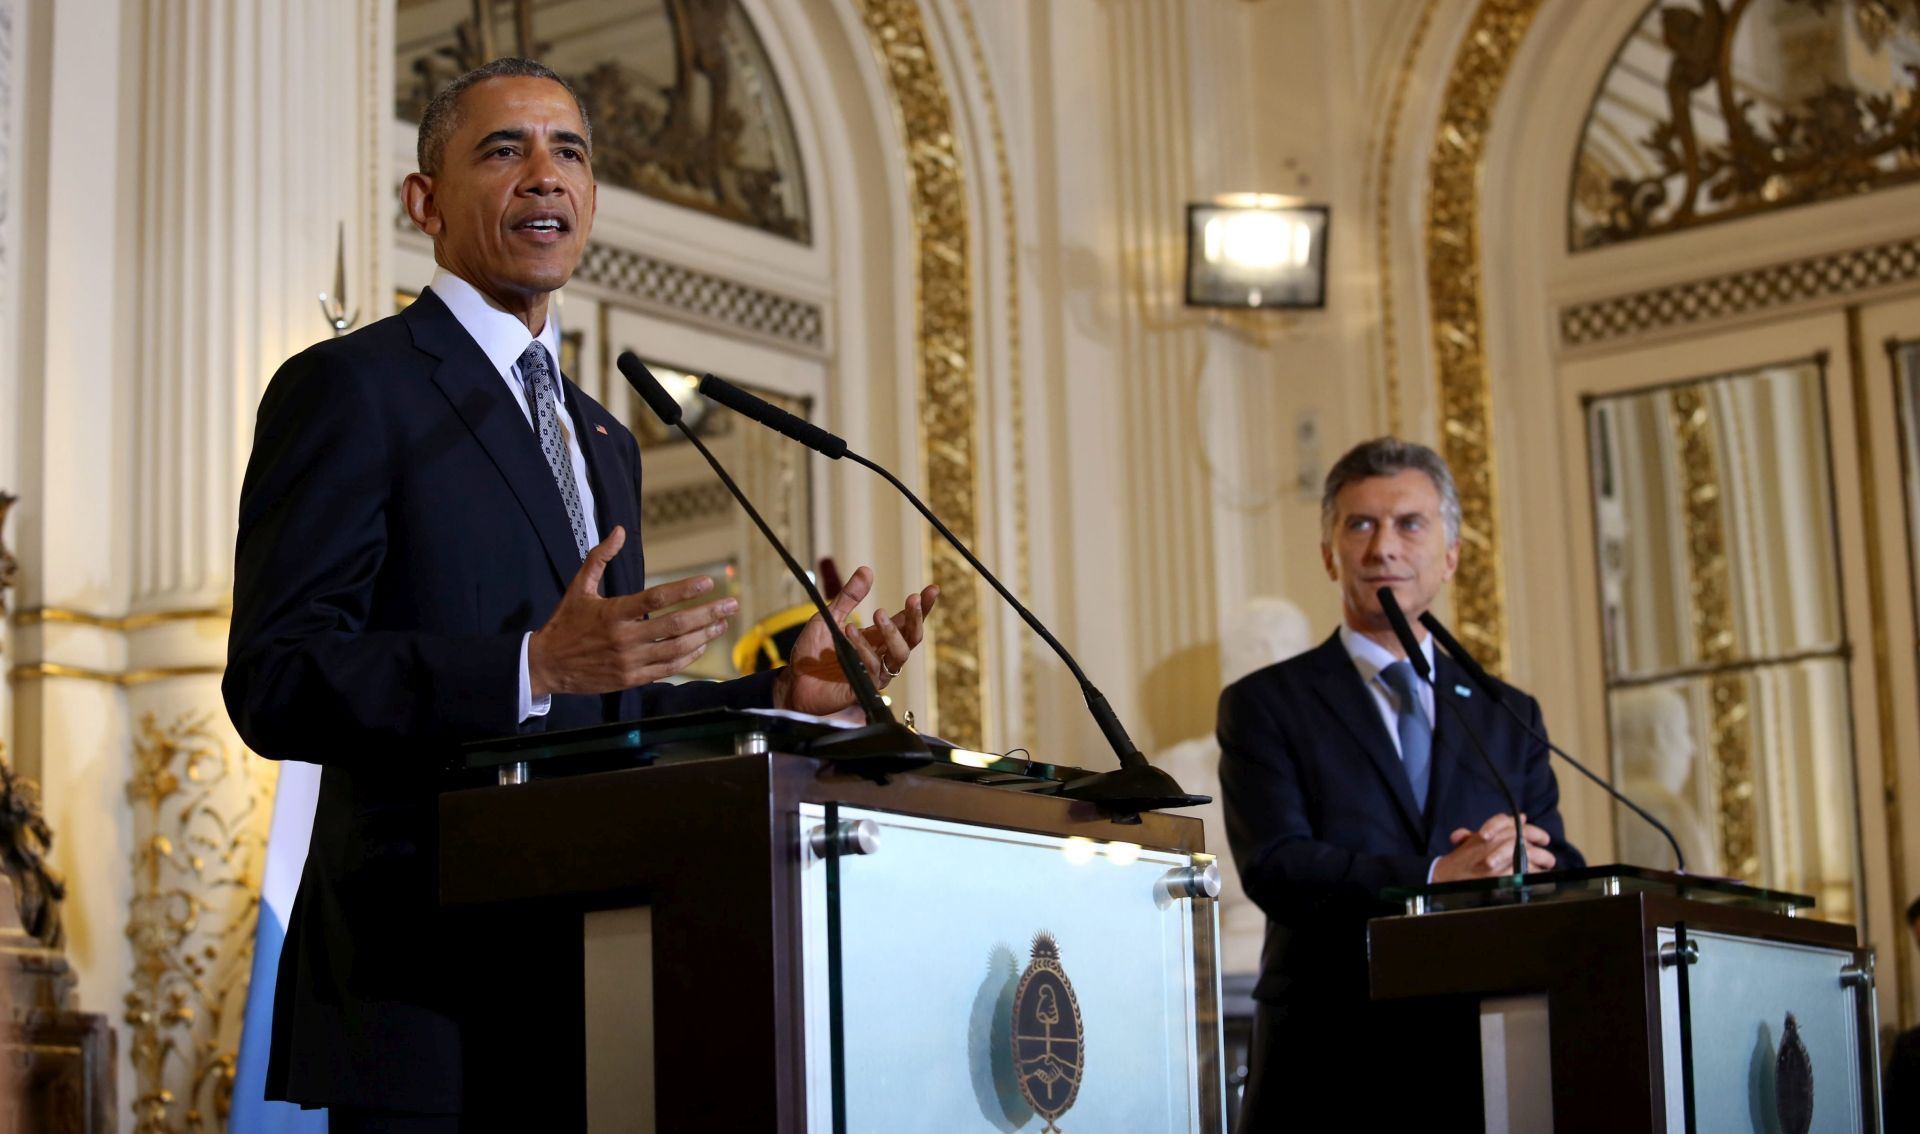 SURADNJA S BUENOS AIRESOM: Obama pohvalio brzu provedbu gospodarskih reformi